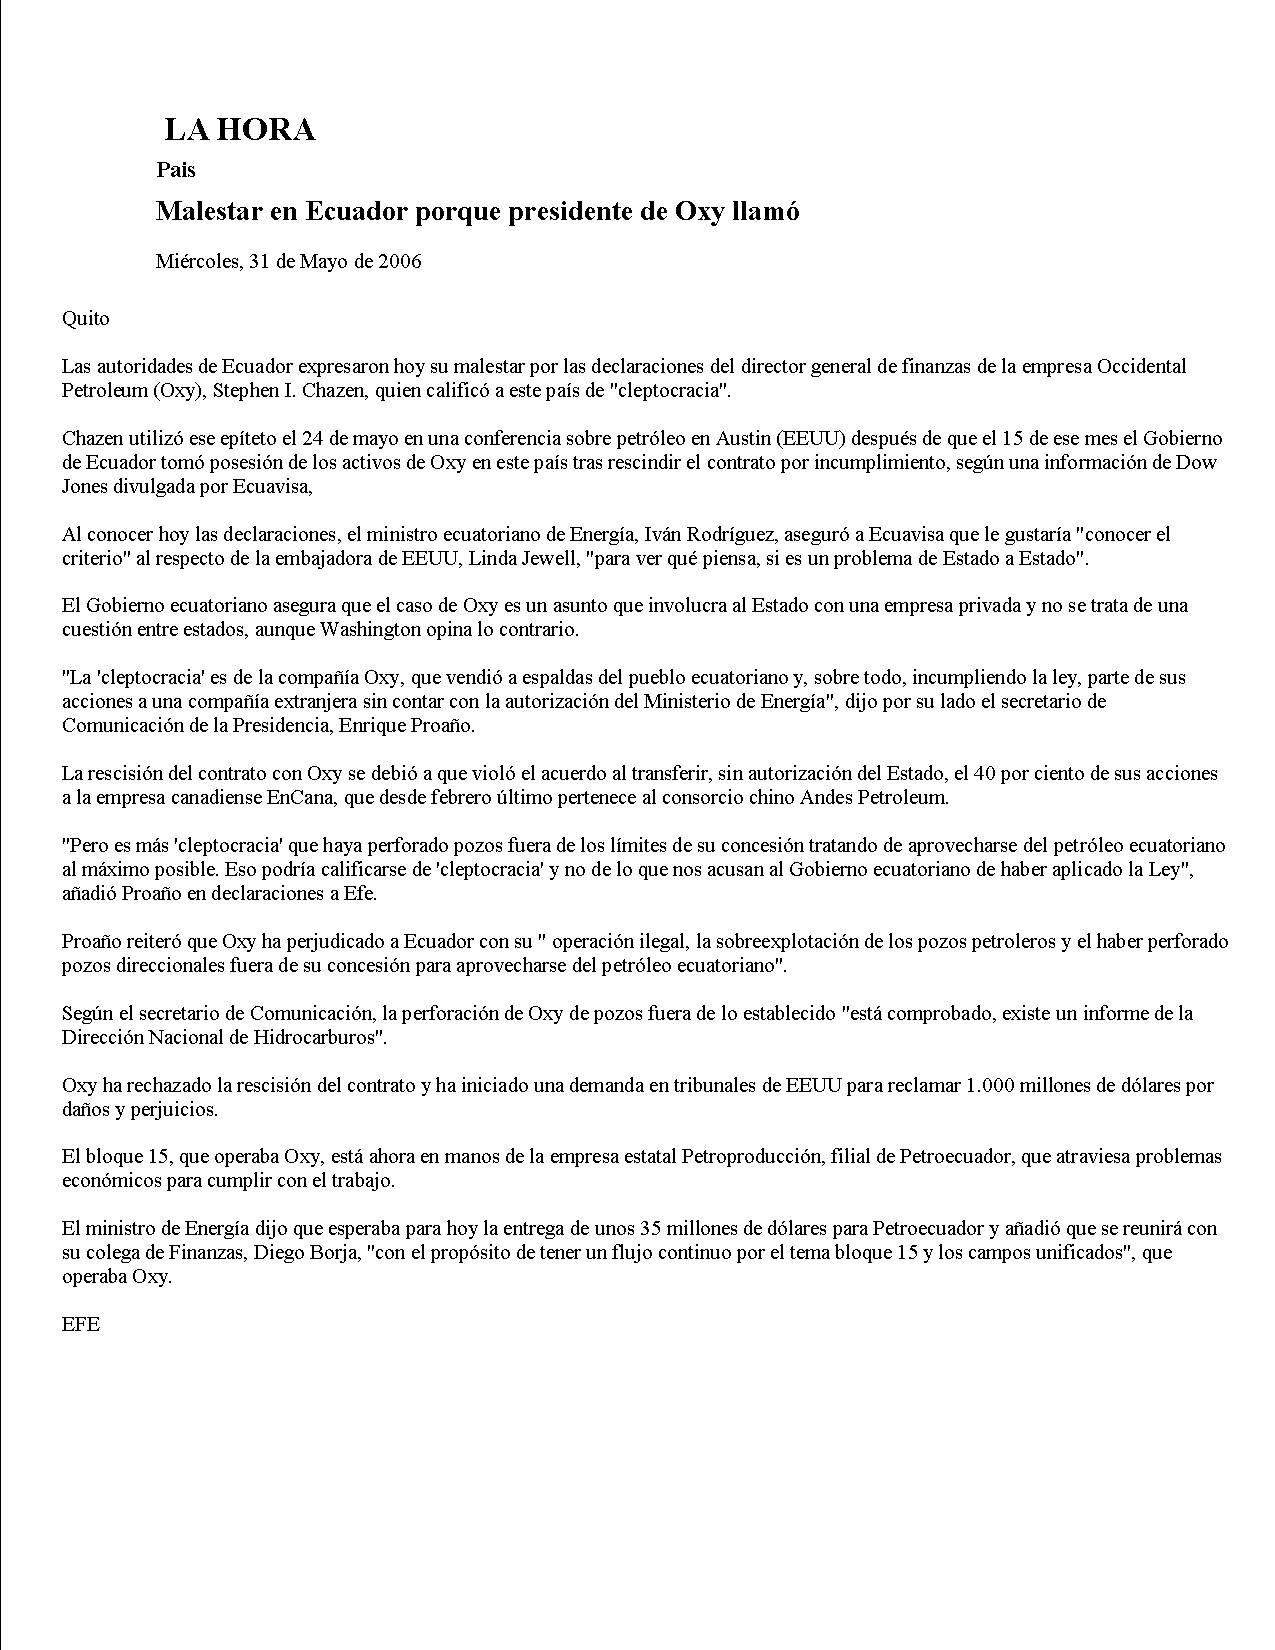 16-LA HORA 31-05-2006 Malestar en Ecuador porque presidente de Oxy llamo